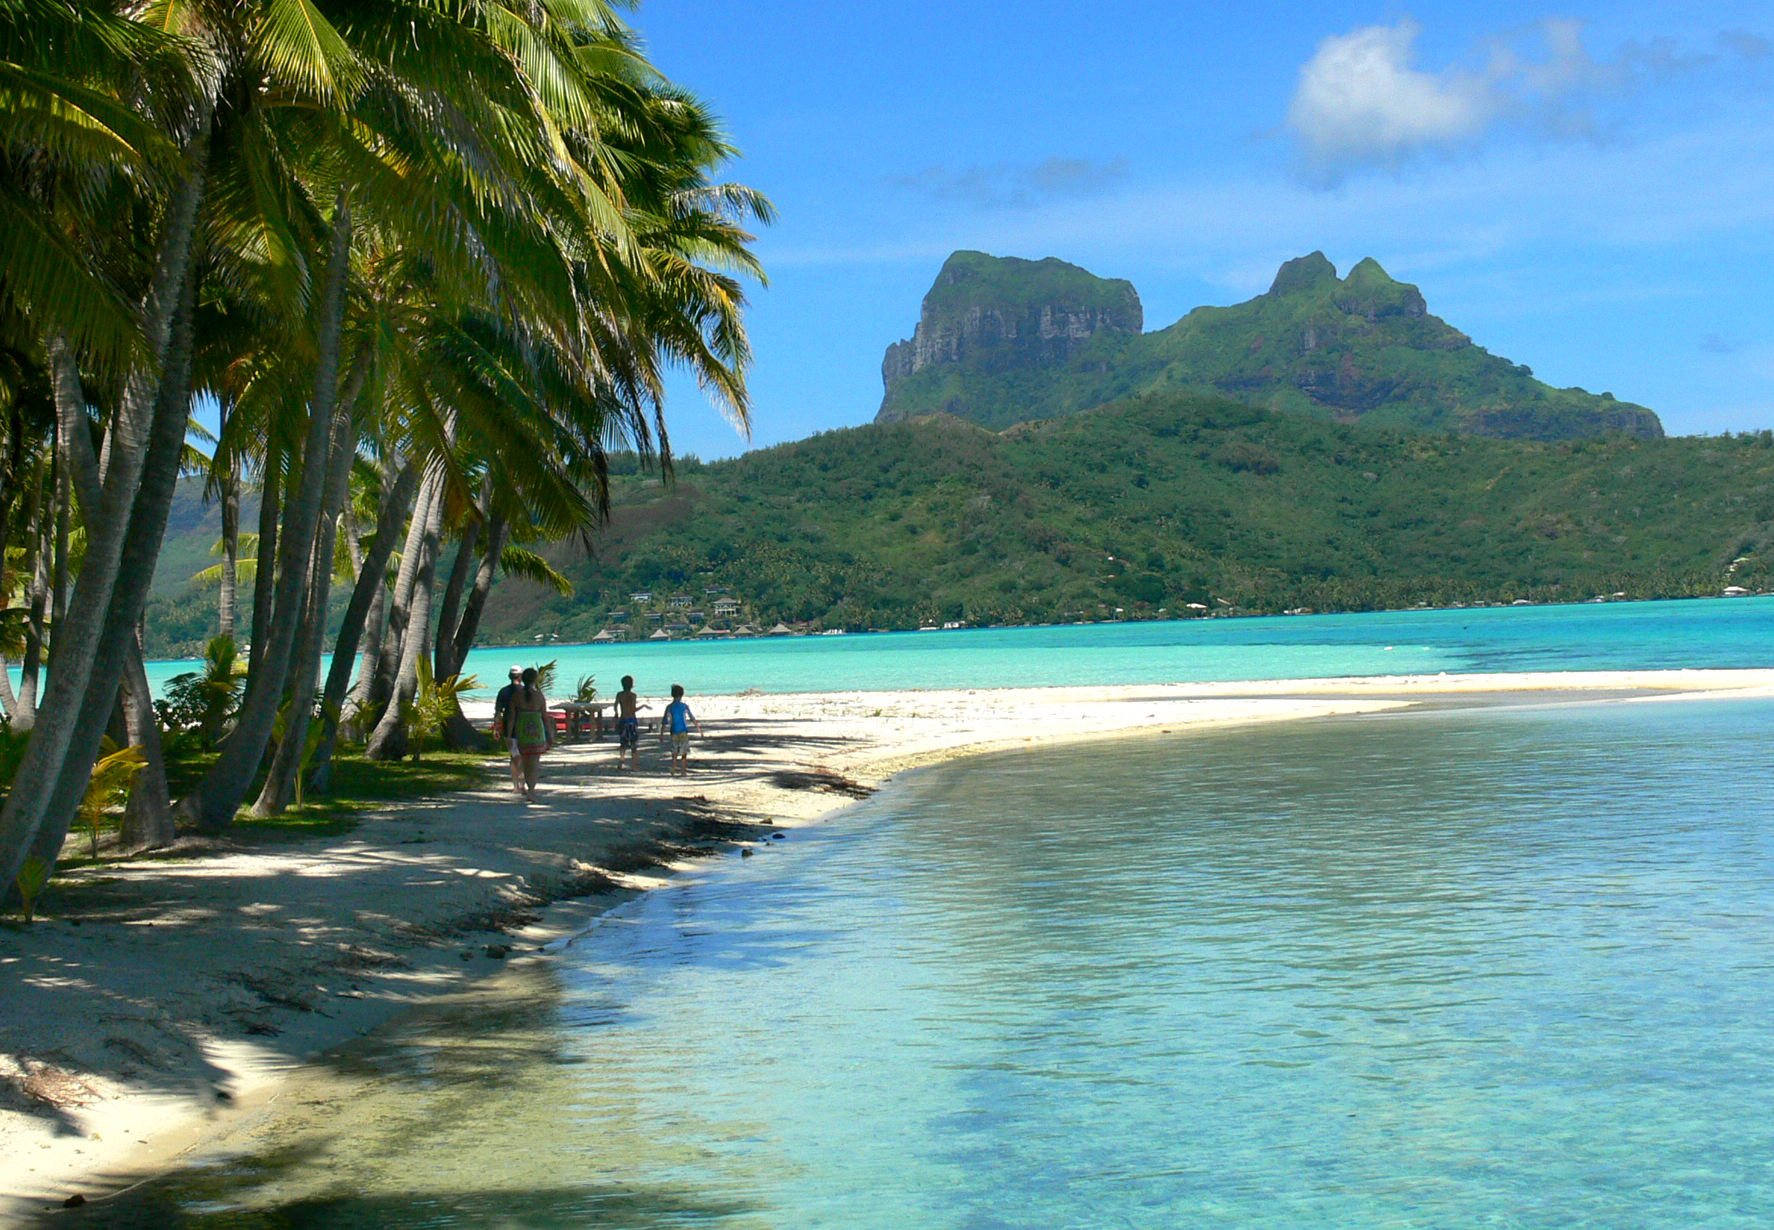 French Polynesia Tahiti Moorea And Bora Bora With Kids